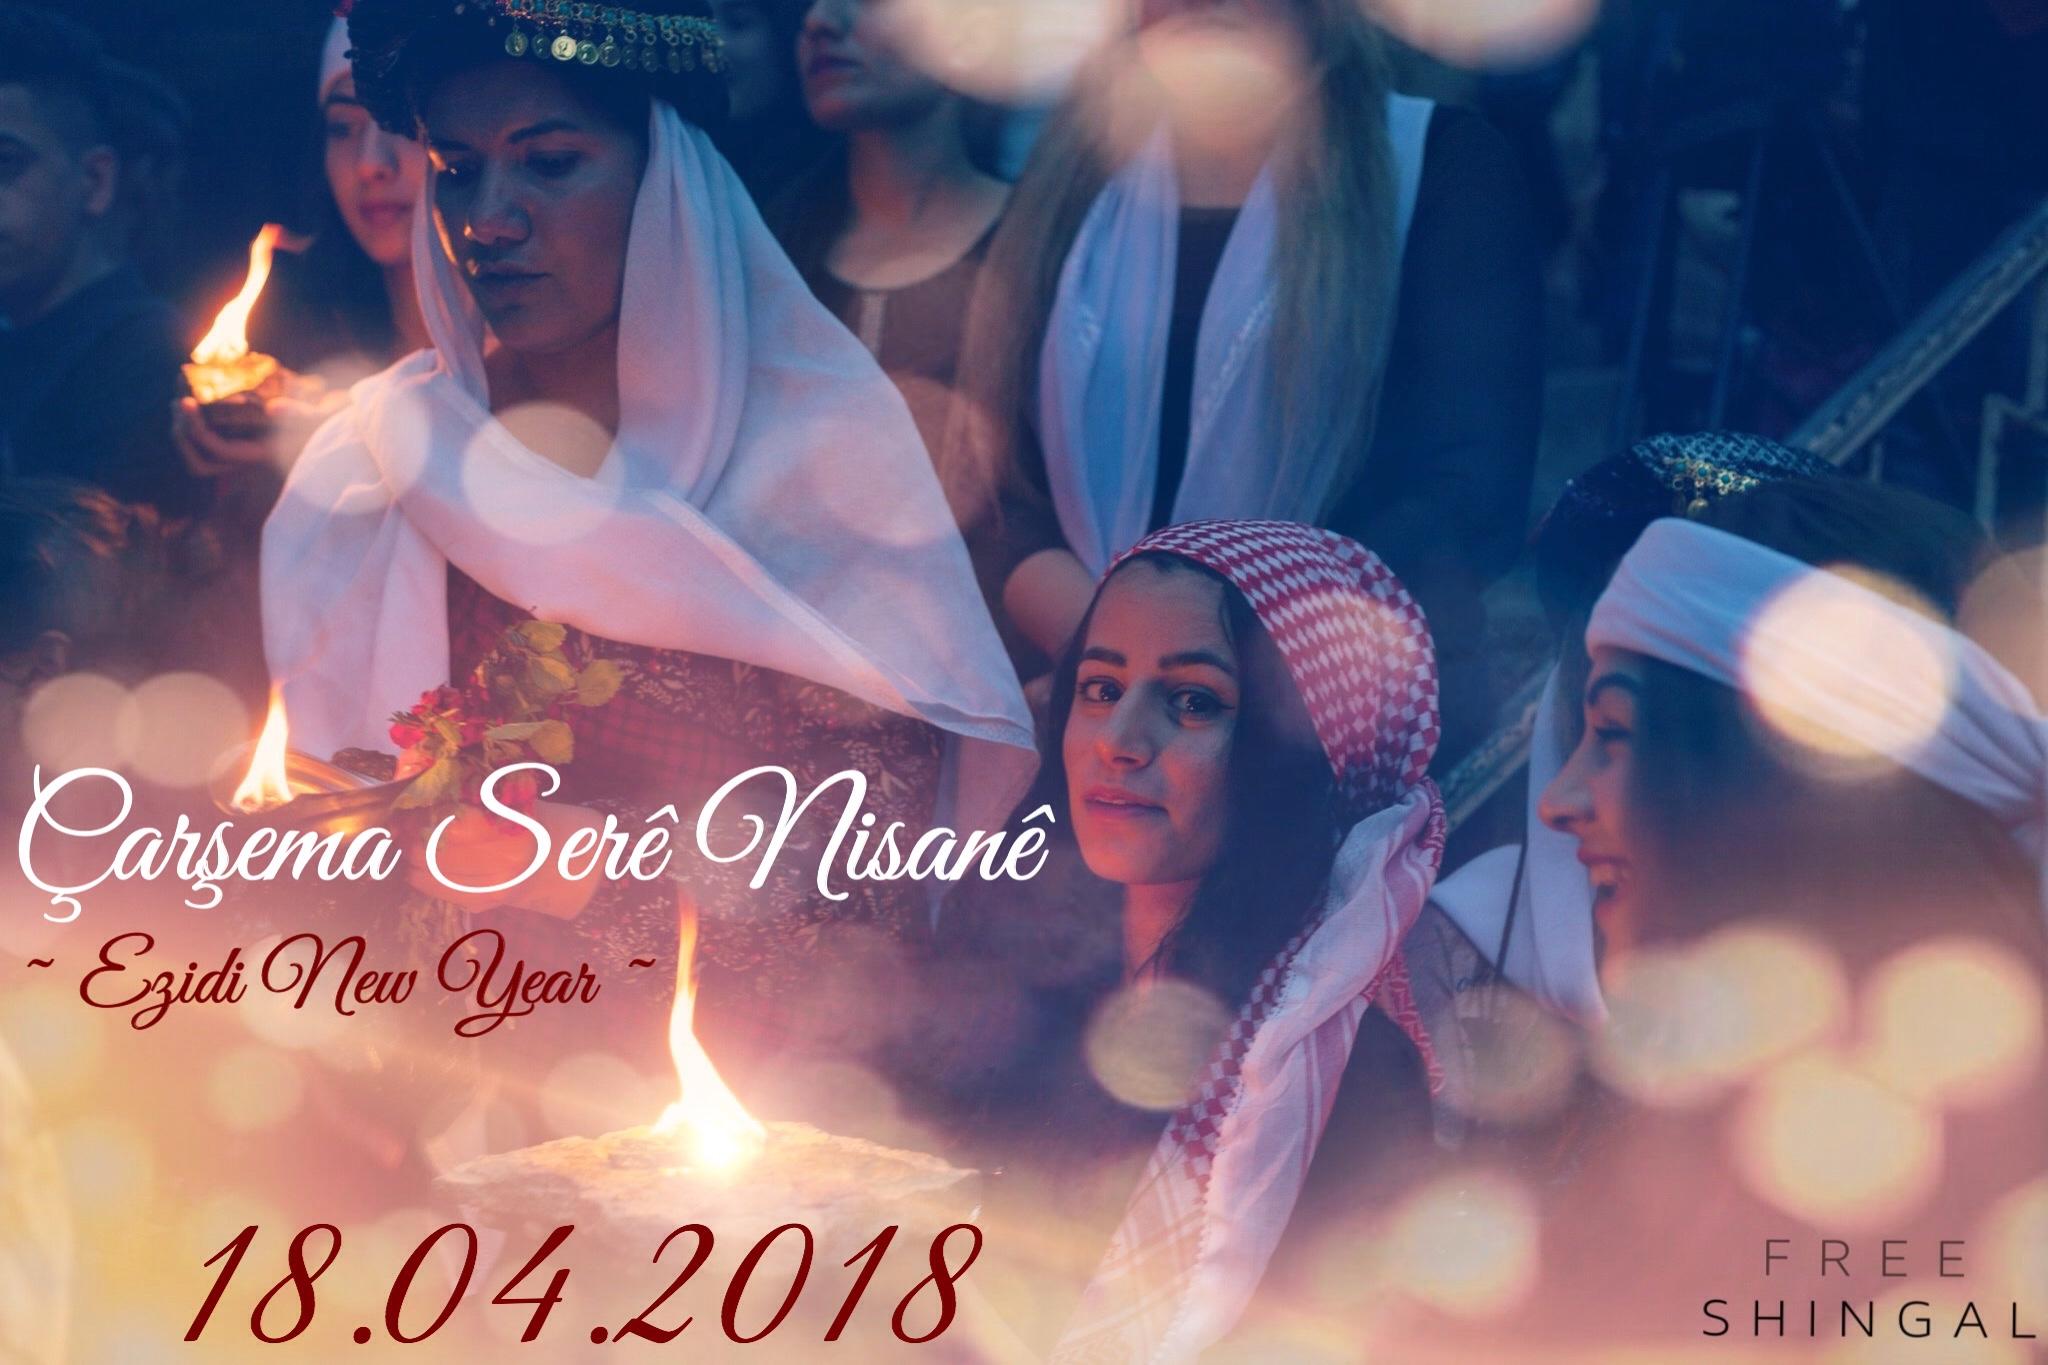 Ezidischer Neujahrsfest. Copyright Foto: FreeShingal.